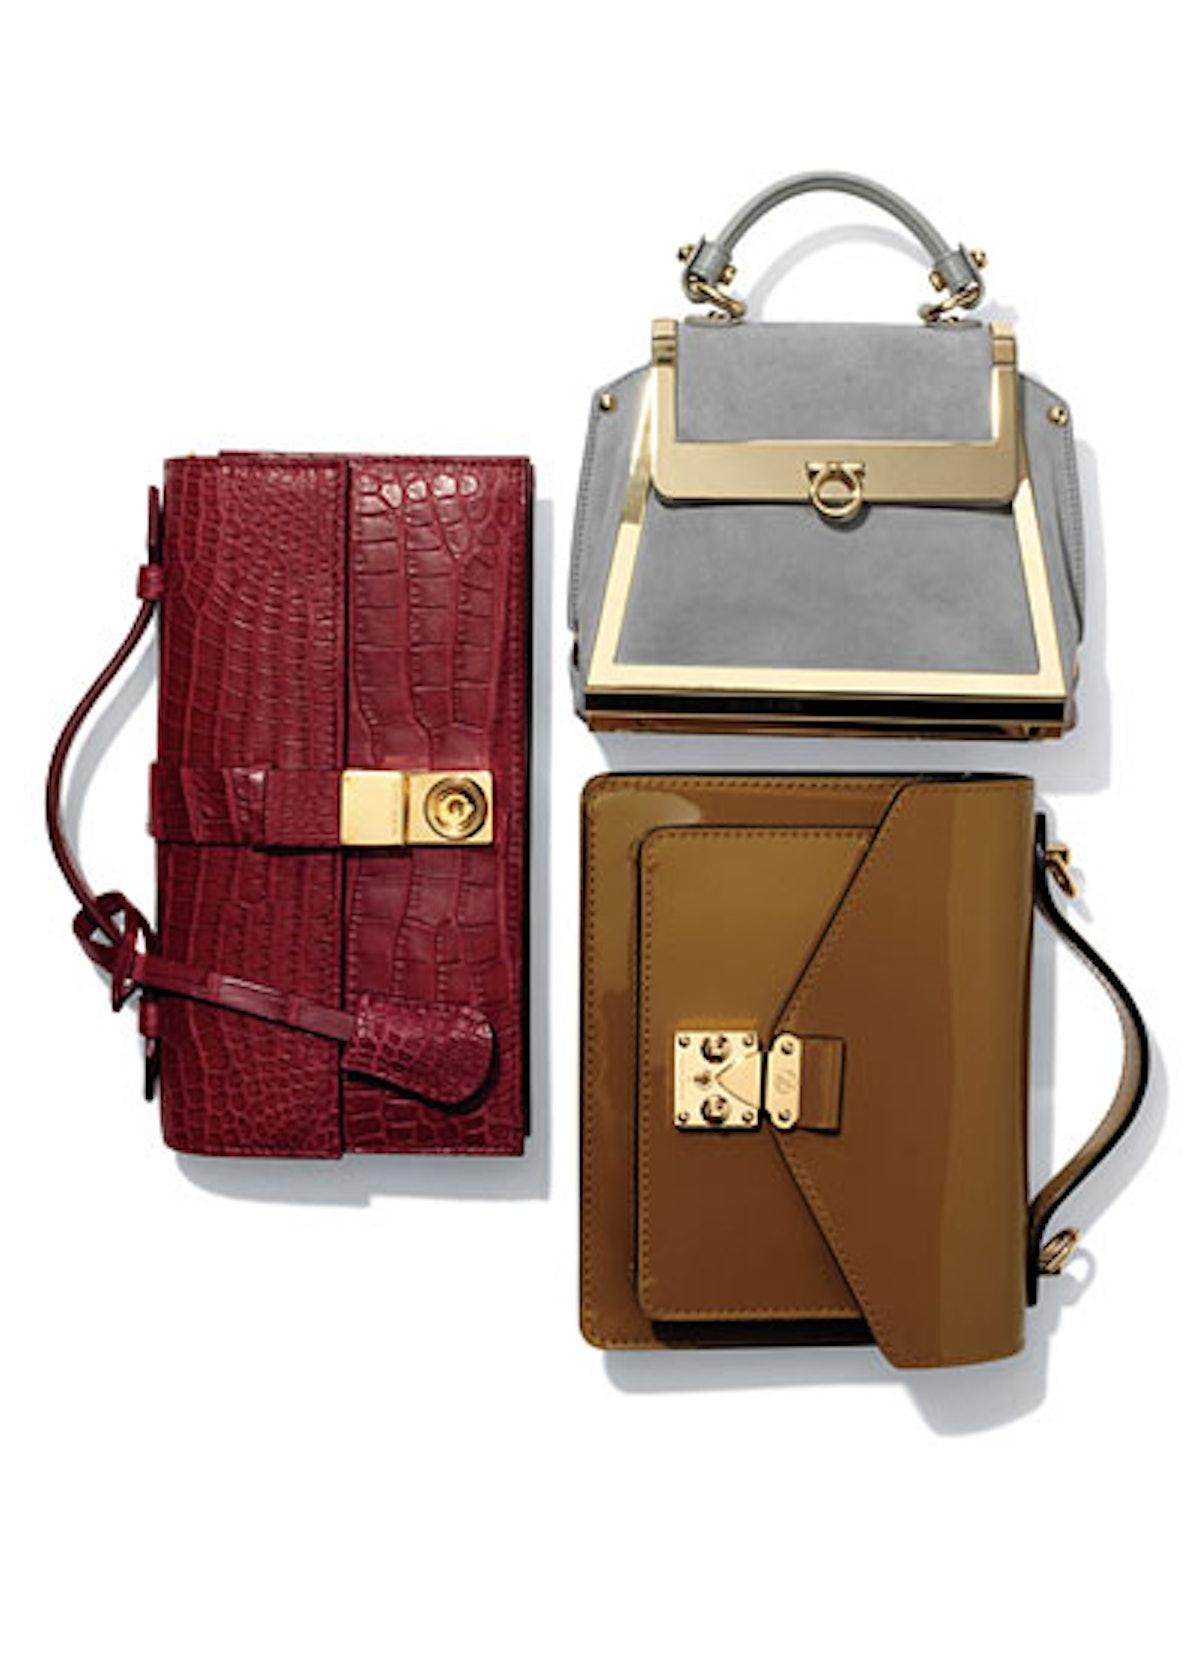 fass-karla-martinez-fashion-picks-02-v.jpg